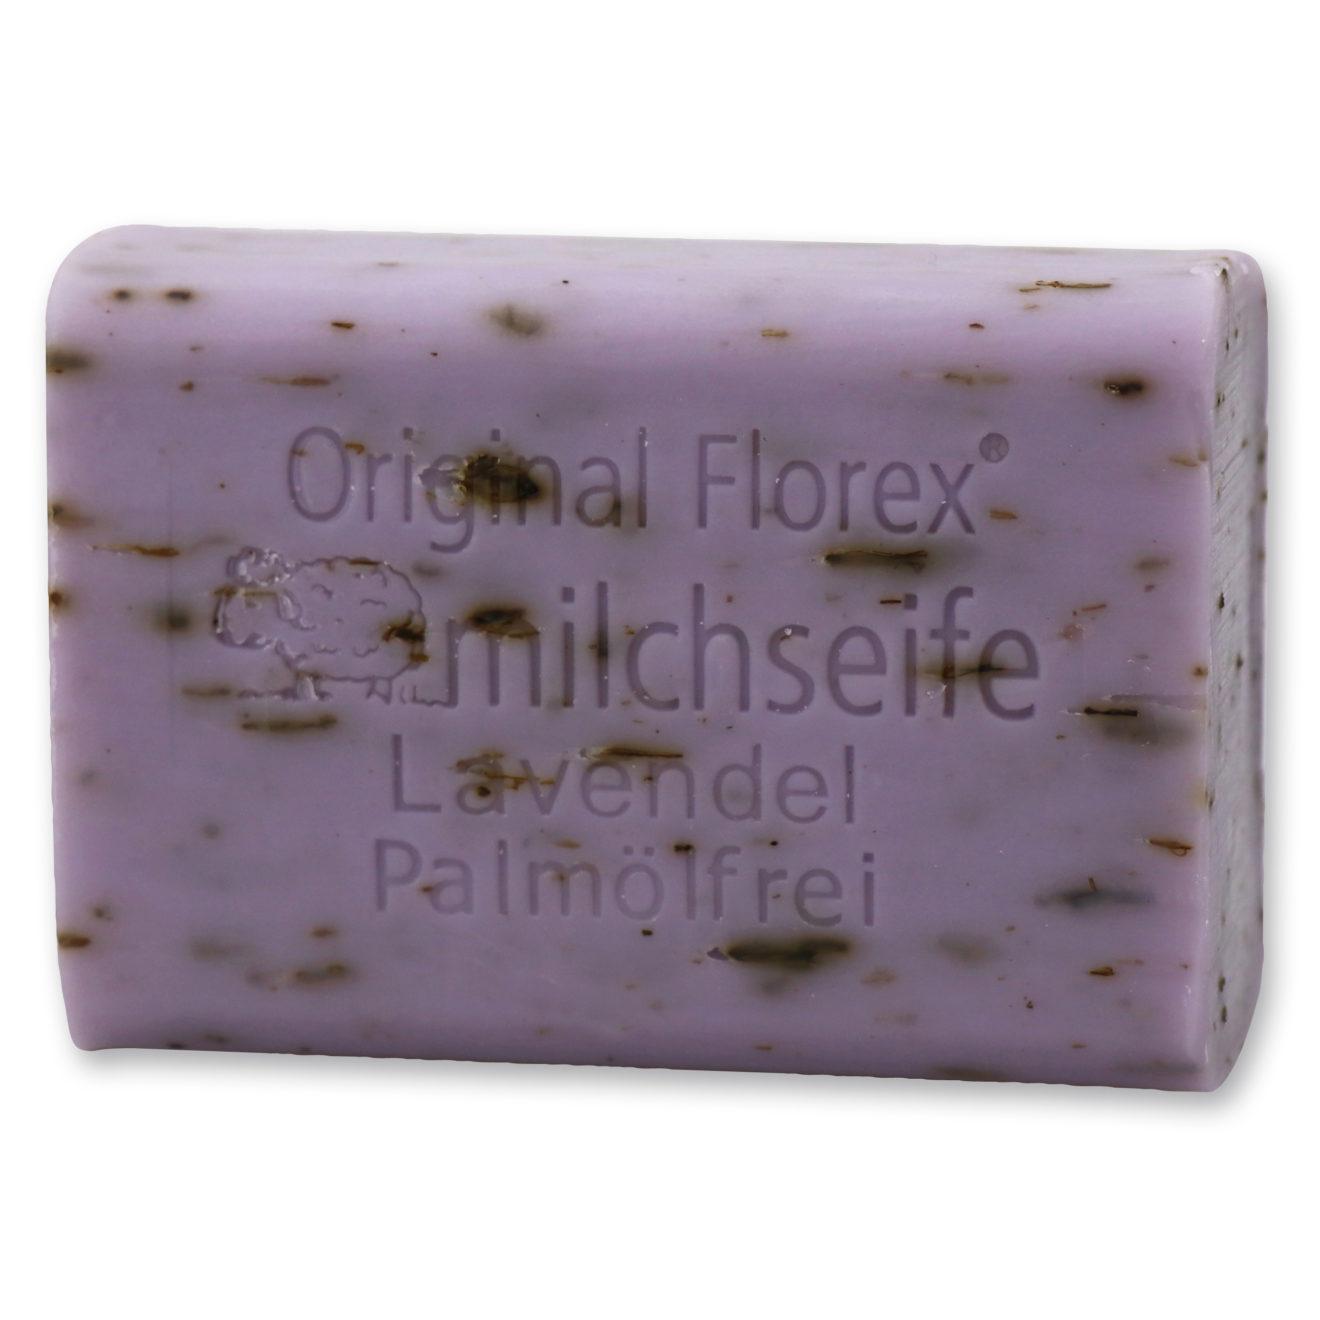 Lavendelseife Palmölfrei